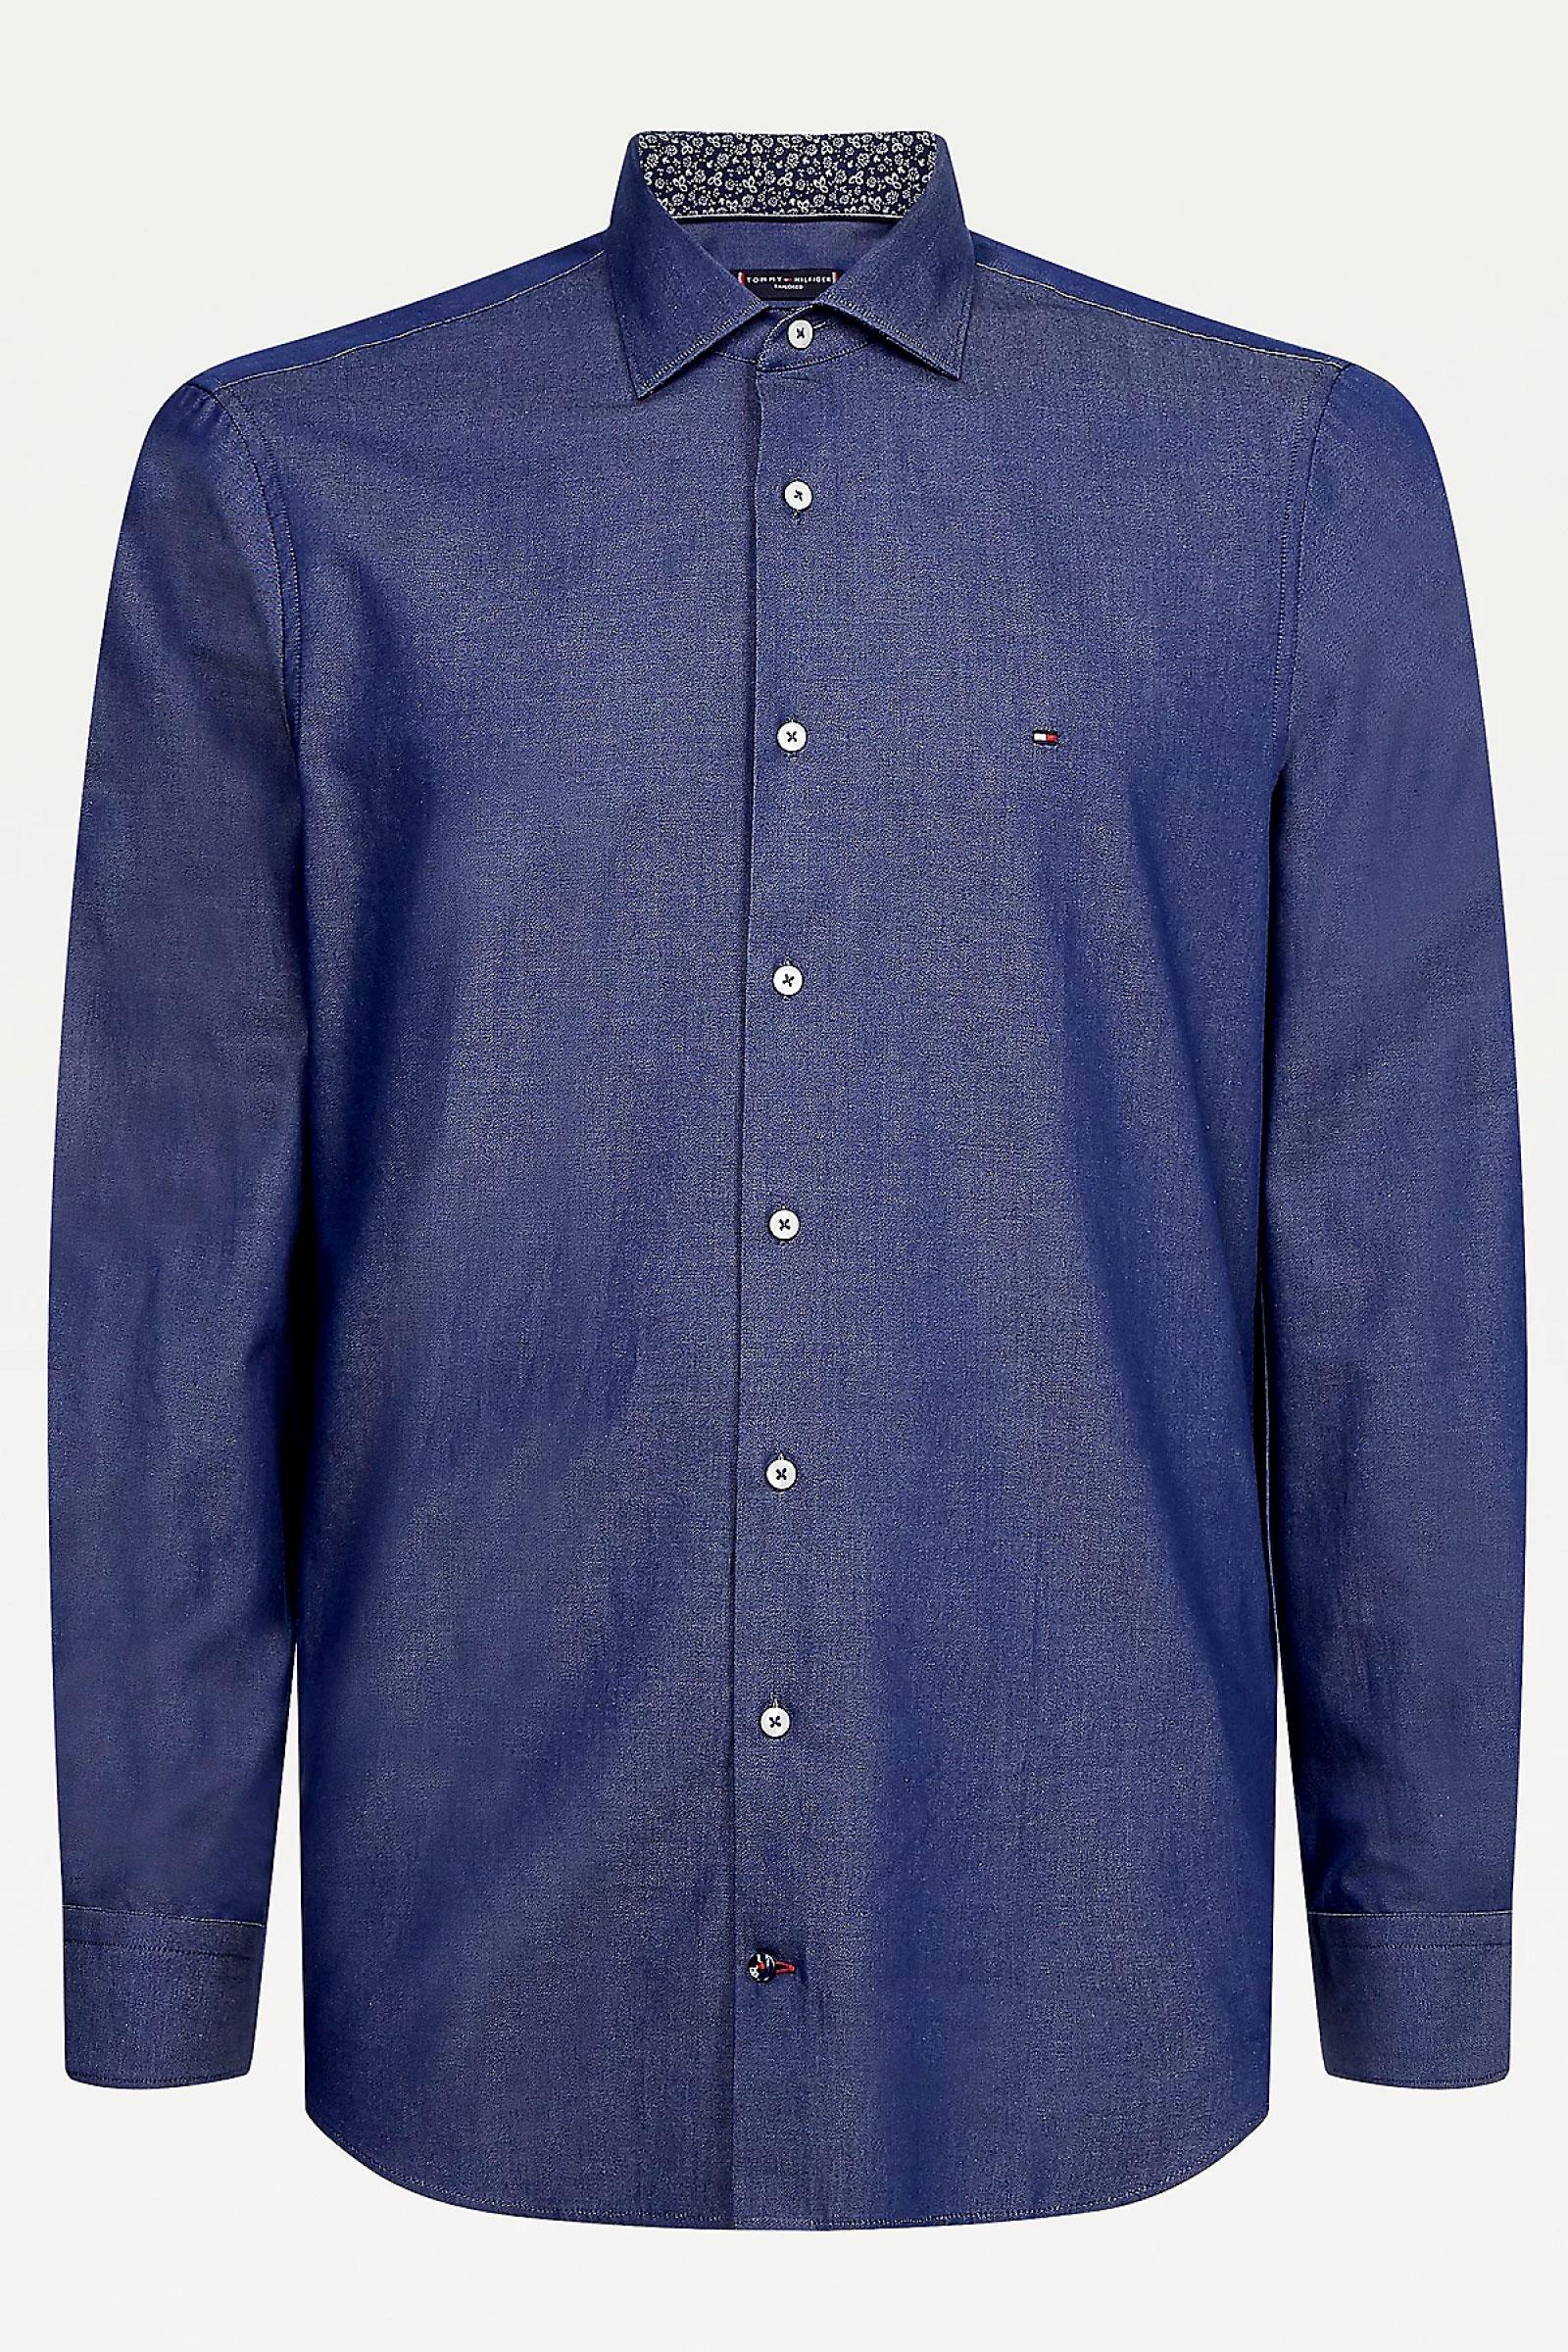 TOMMY HILFIGER | Shirt | MW0MW16489DW4